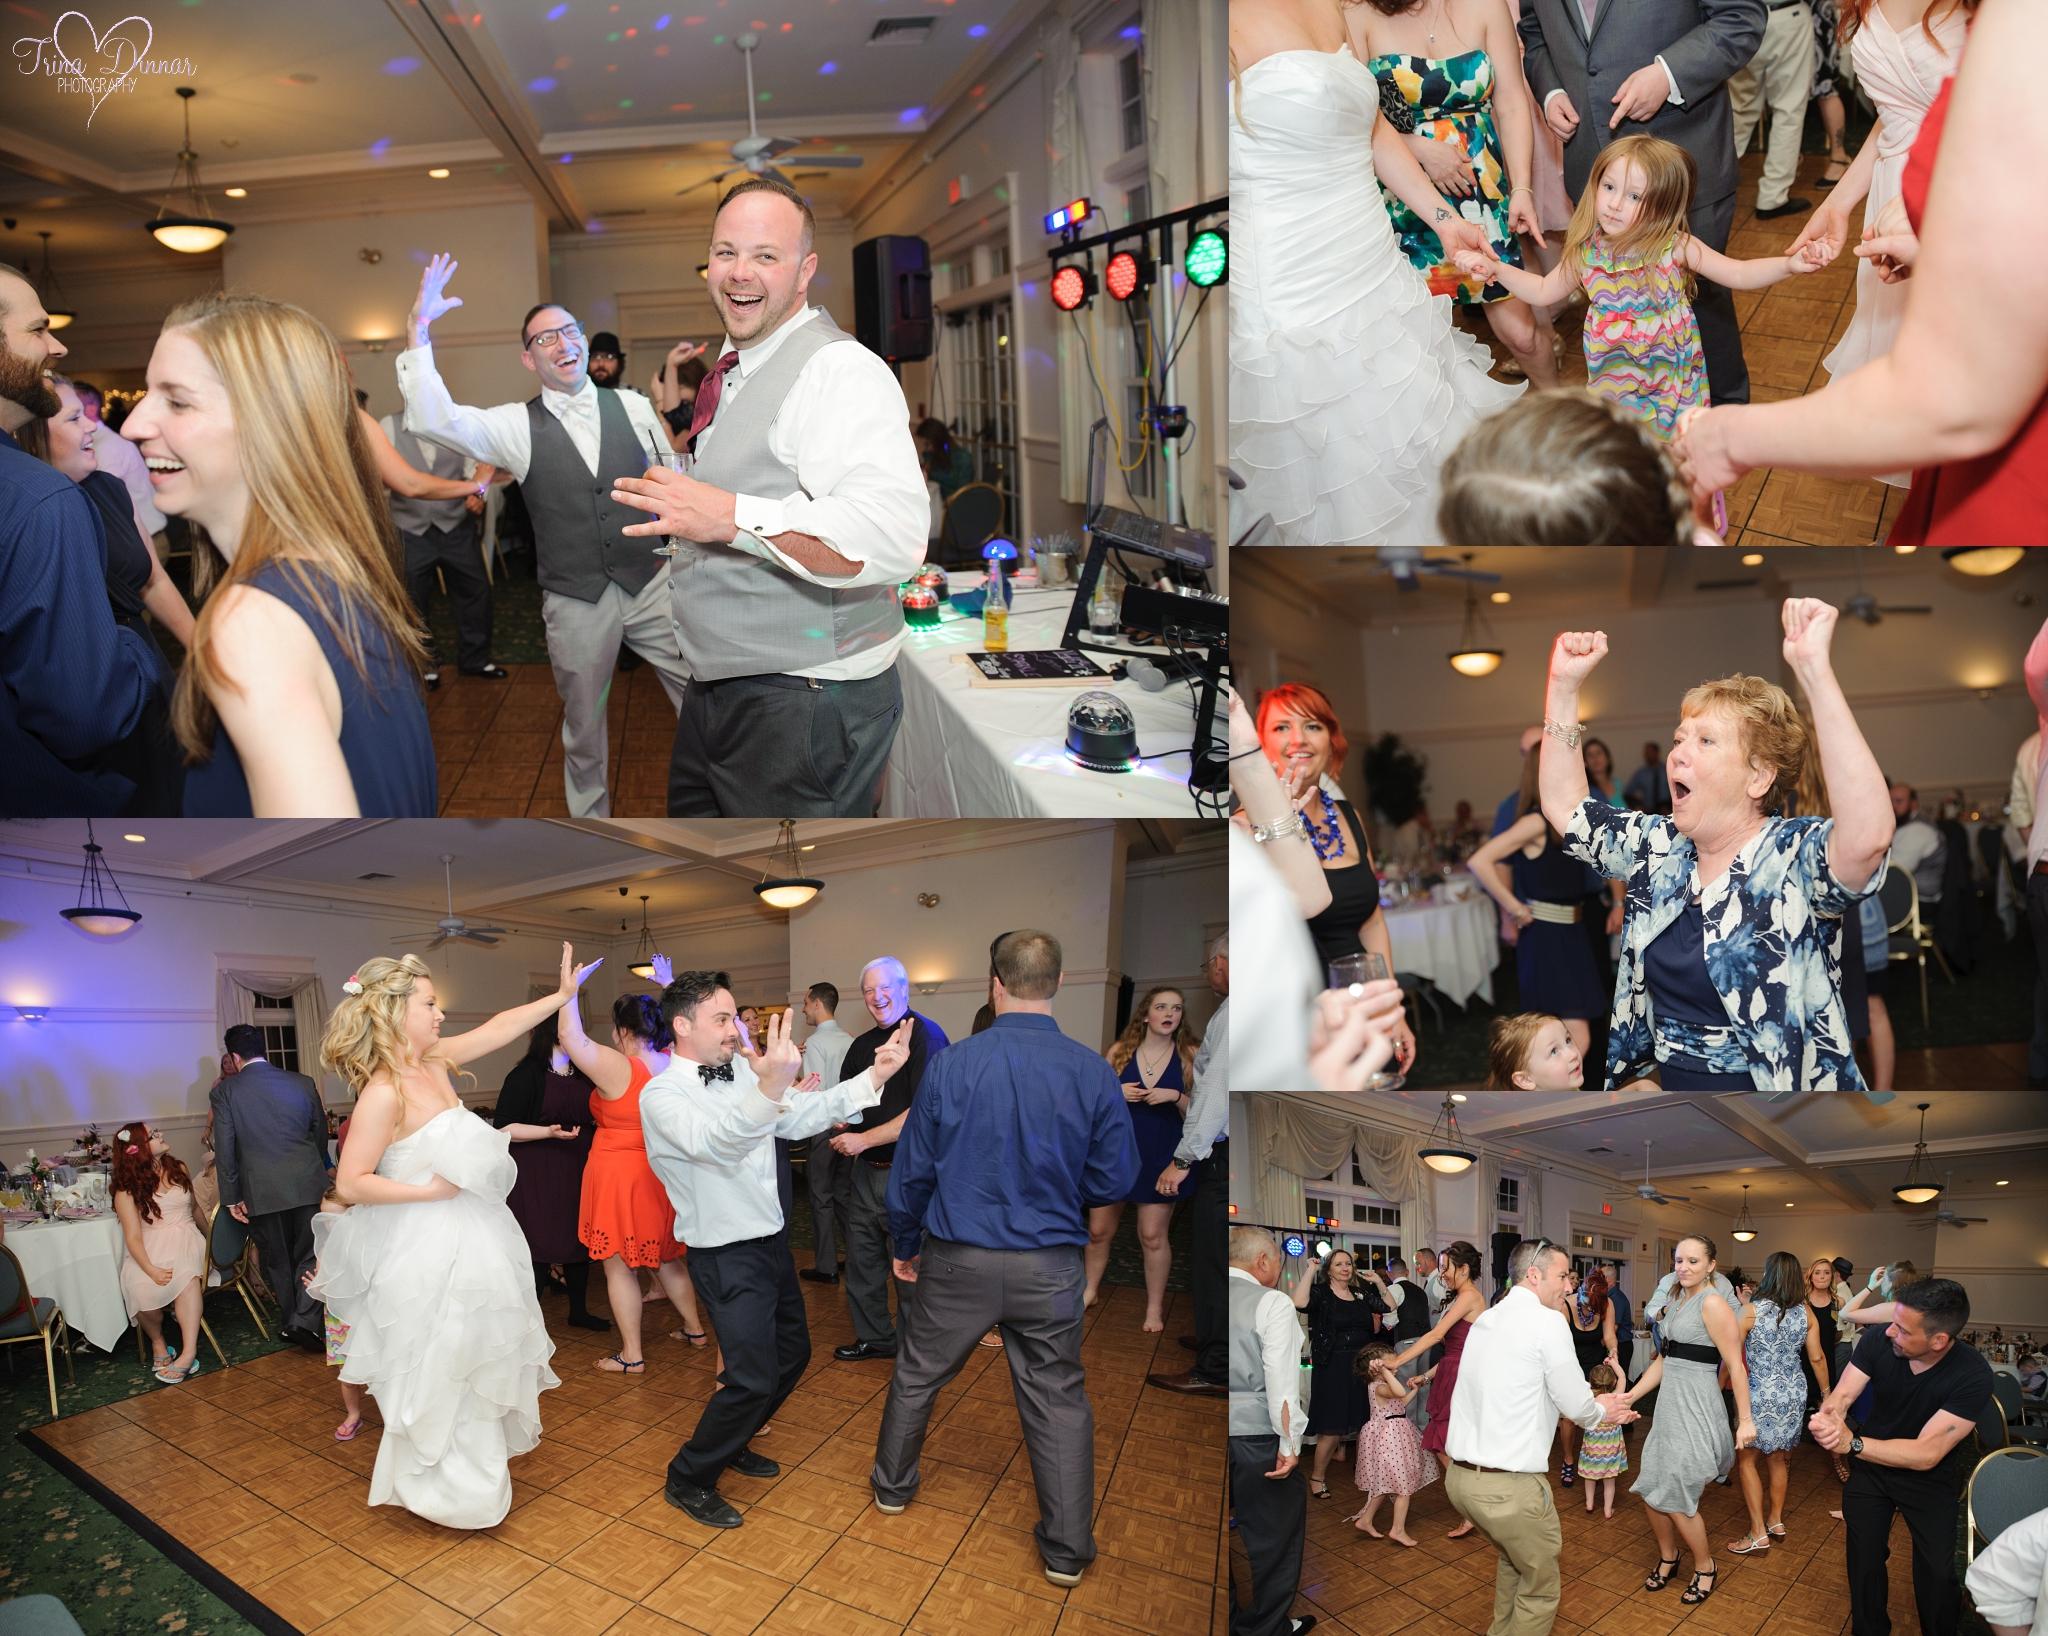 Governor's Inn Rochester wedding reception dancing